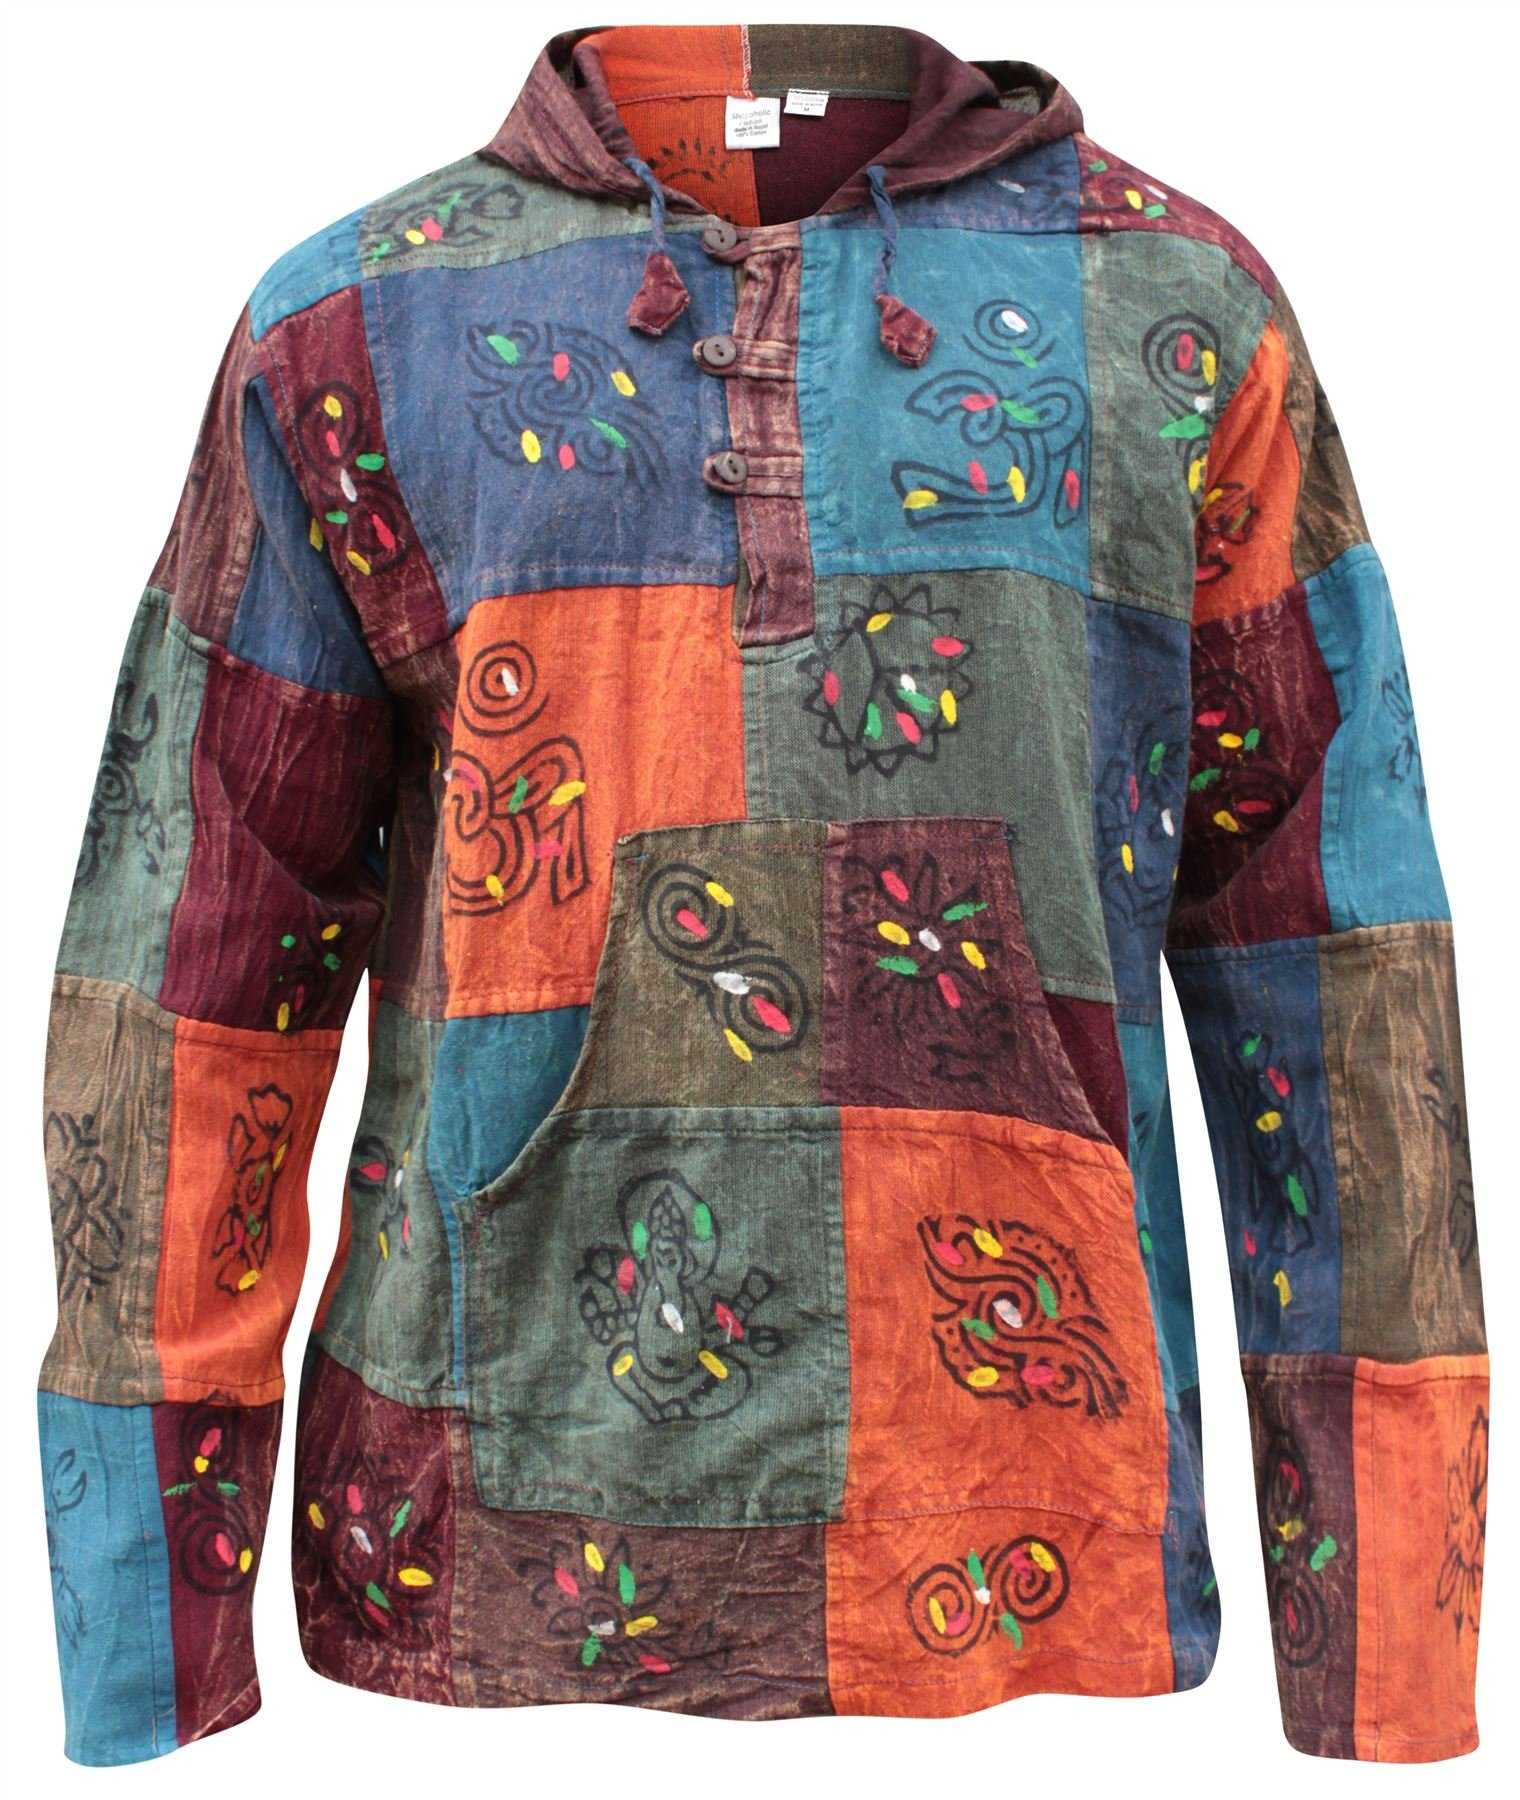 Shopoholic Fashion Mens Plain Patchwork Grandad Hoodie Shirt, Multicoloured, Large